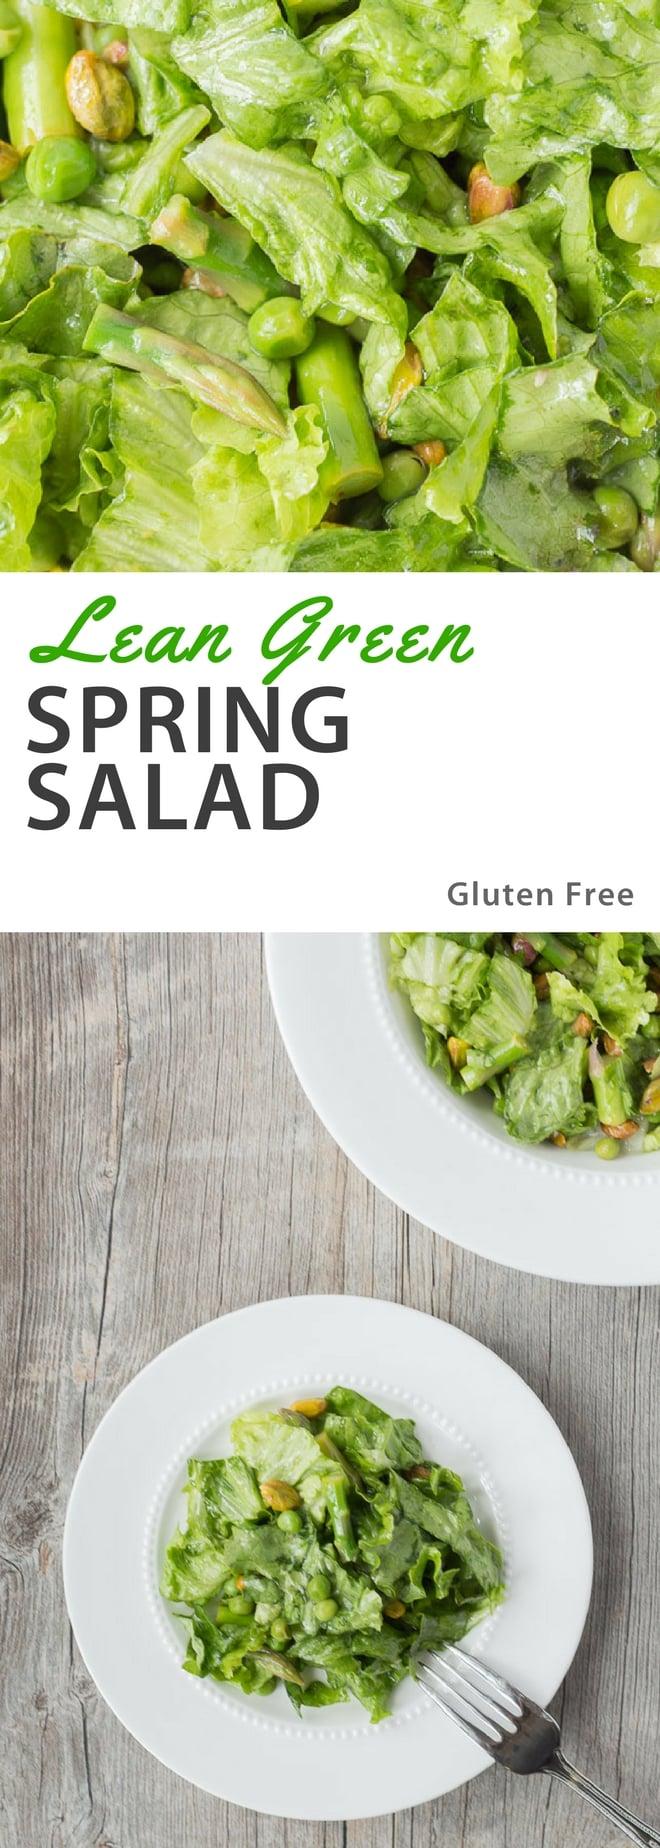 Lean Green Spring Salad